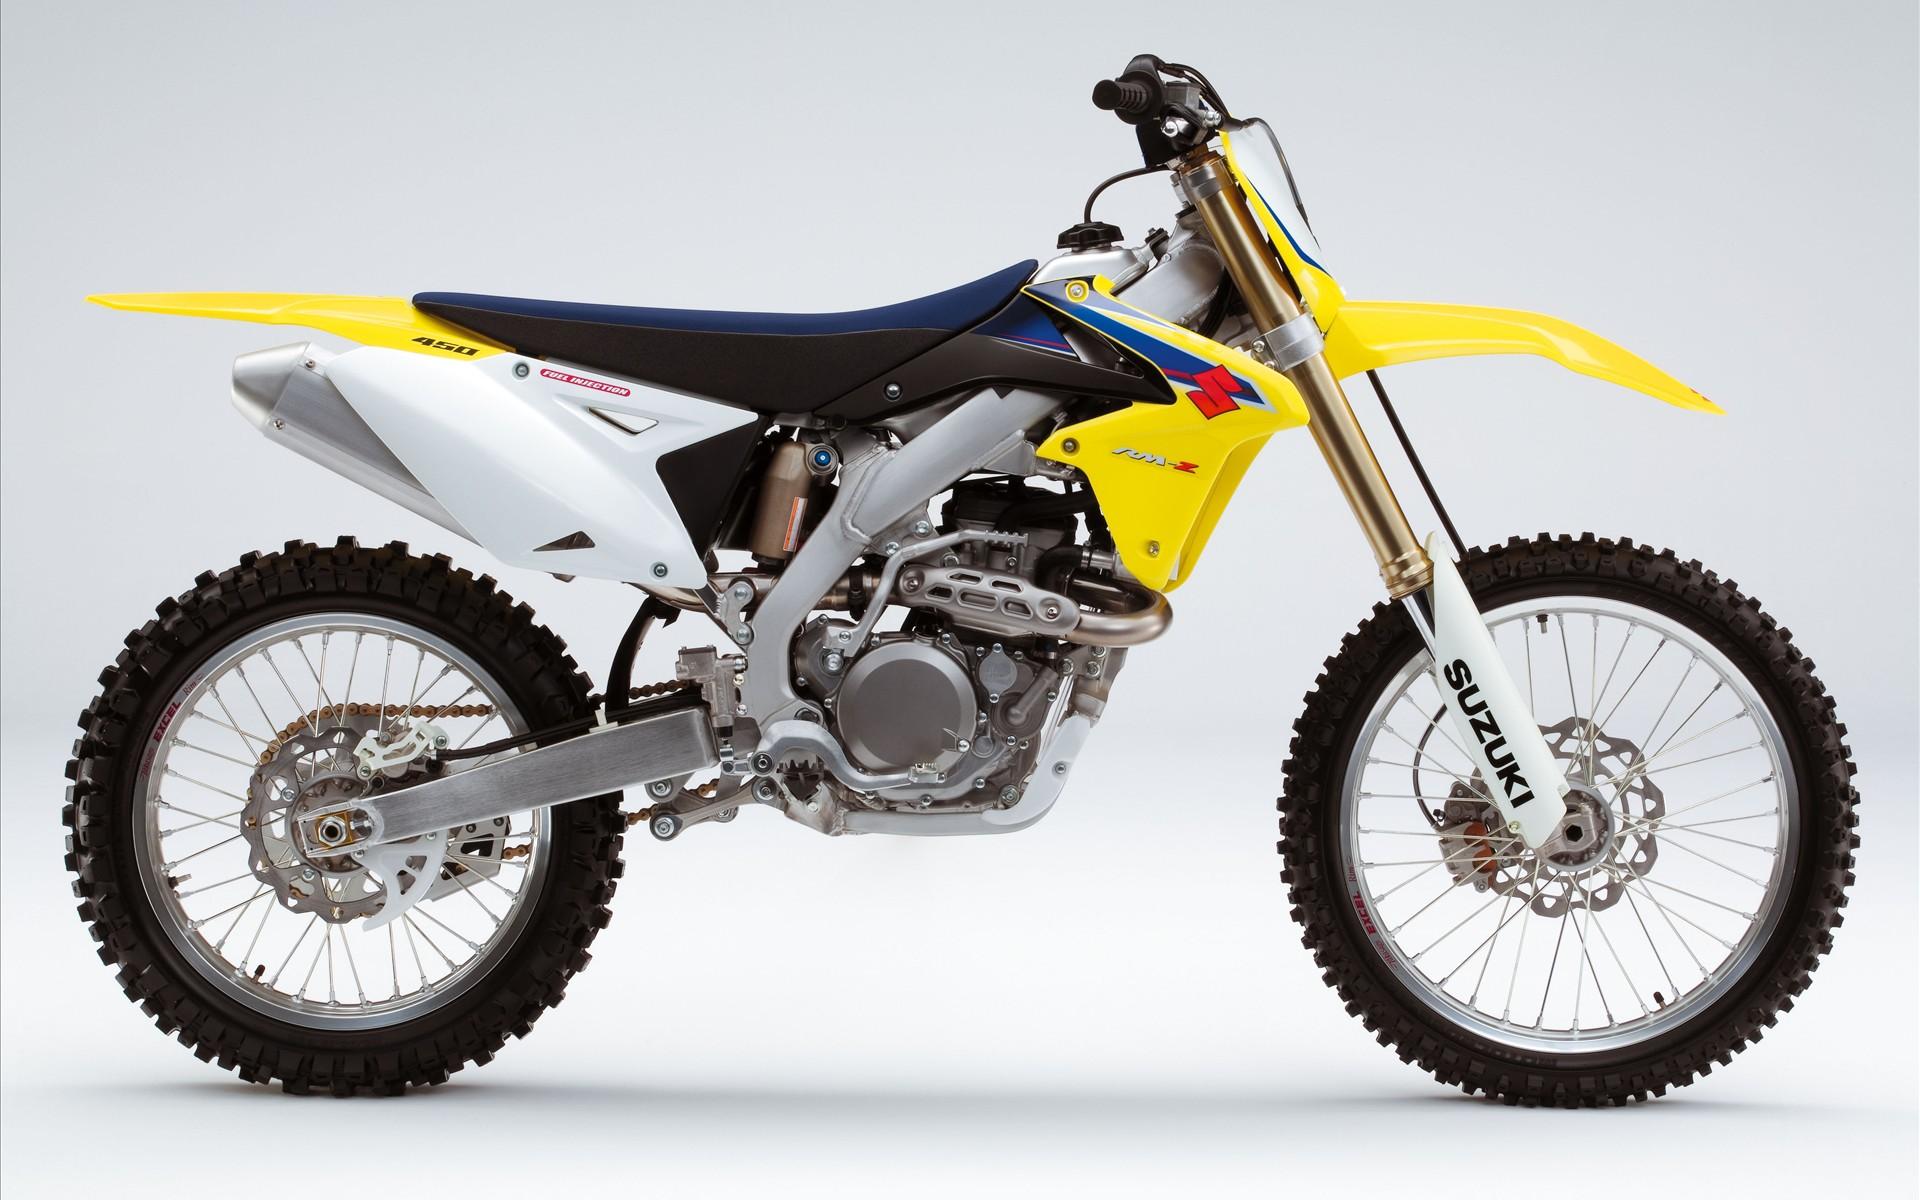 HD Wallpapers 2009 Suzuki RM Z450 Motocross